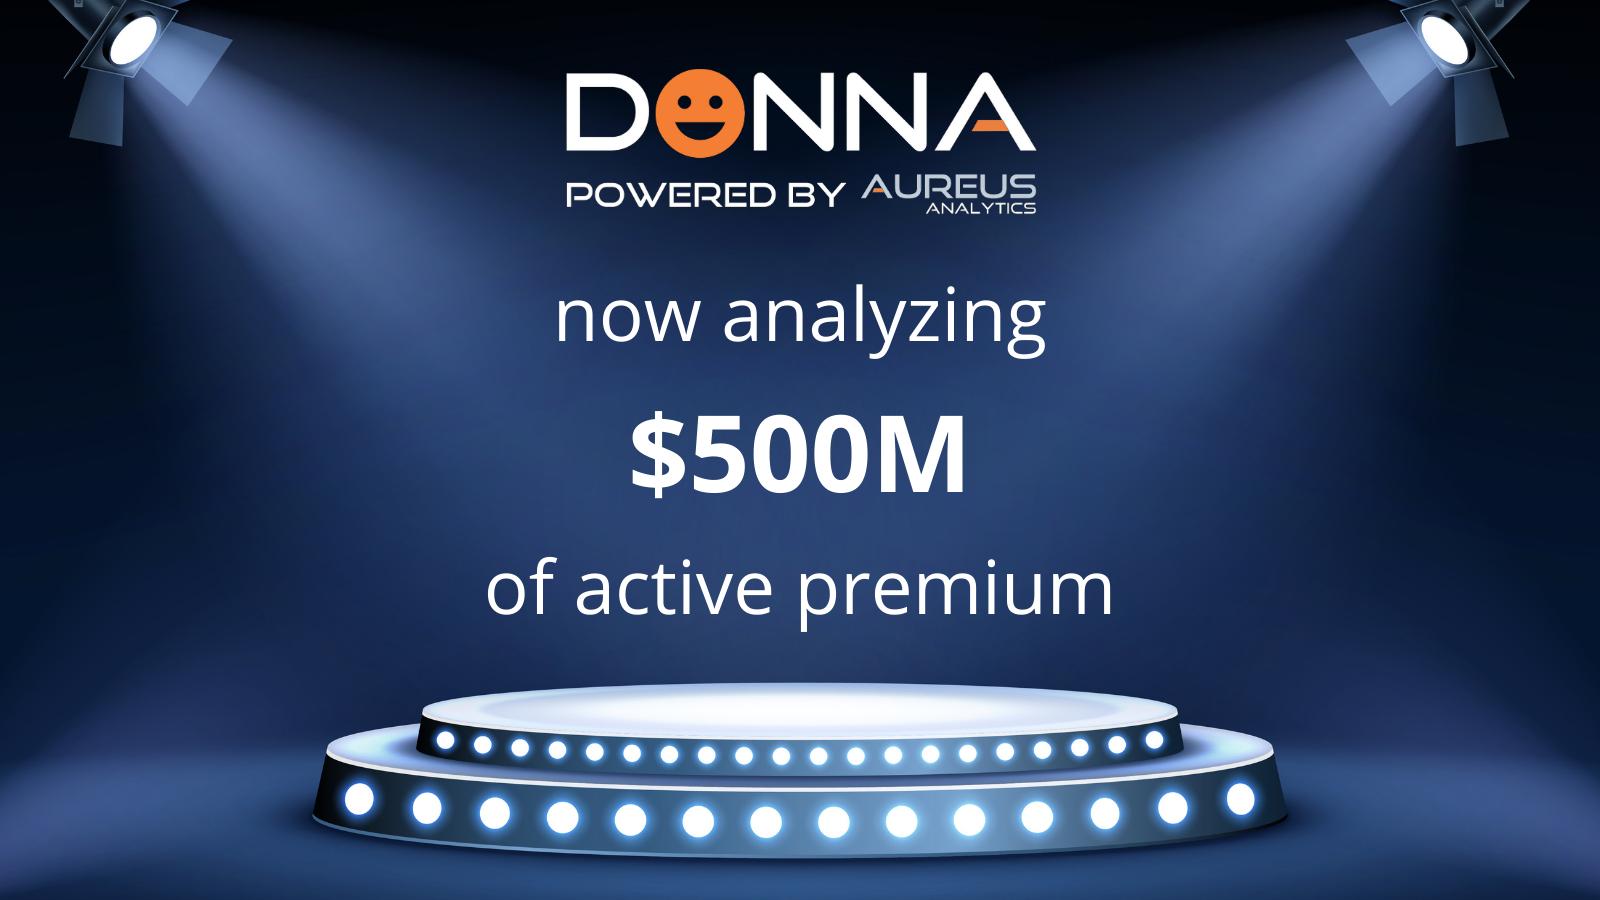 DONNA Milestone $500M (1)